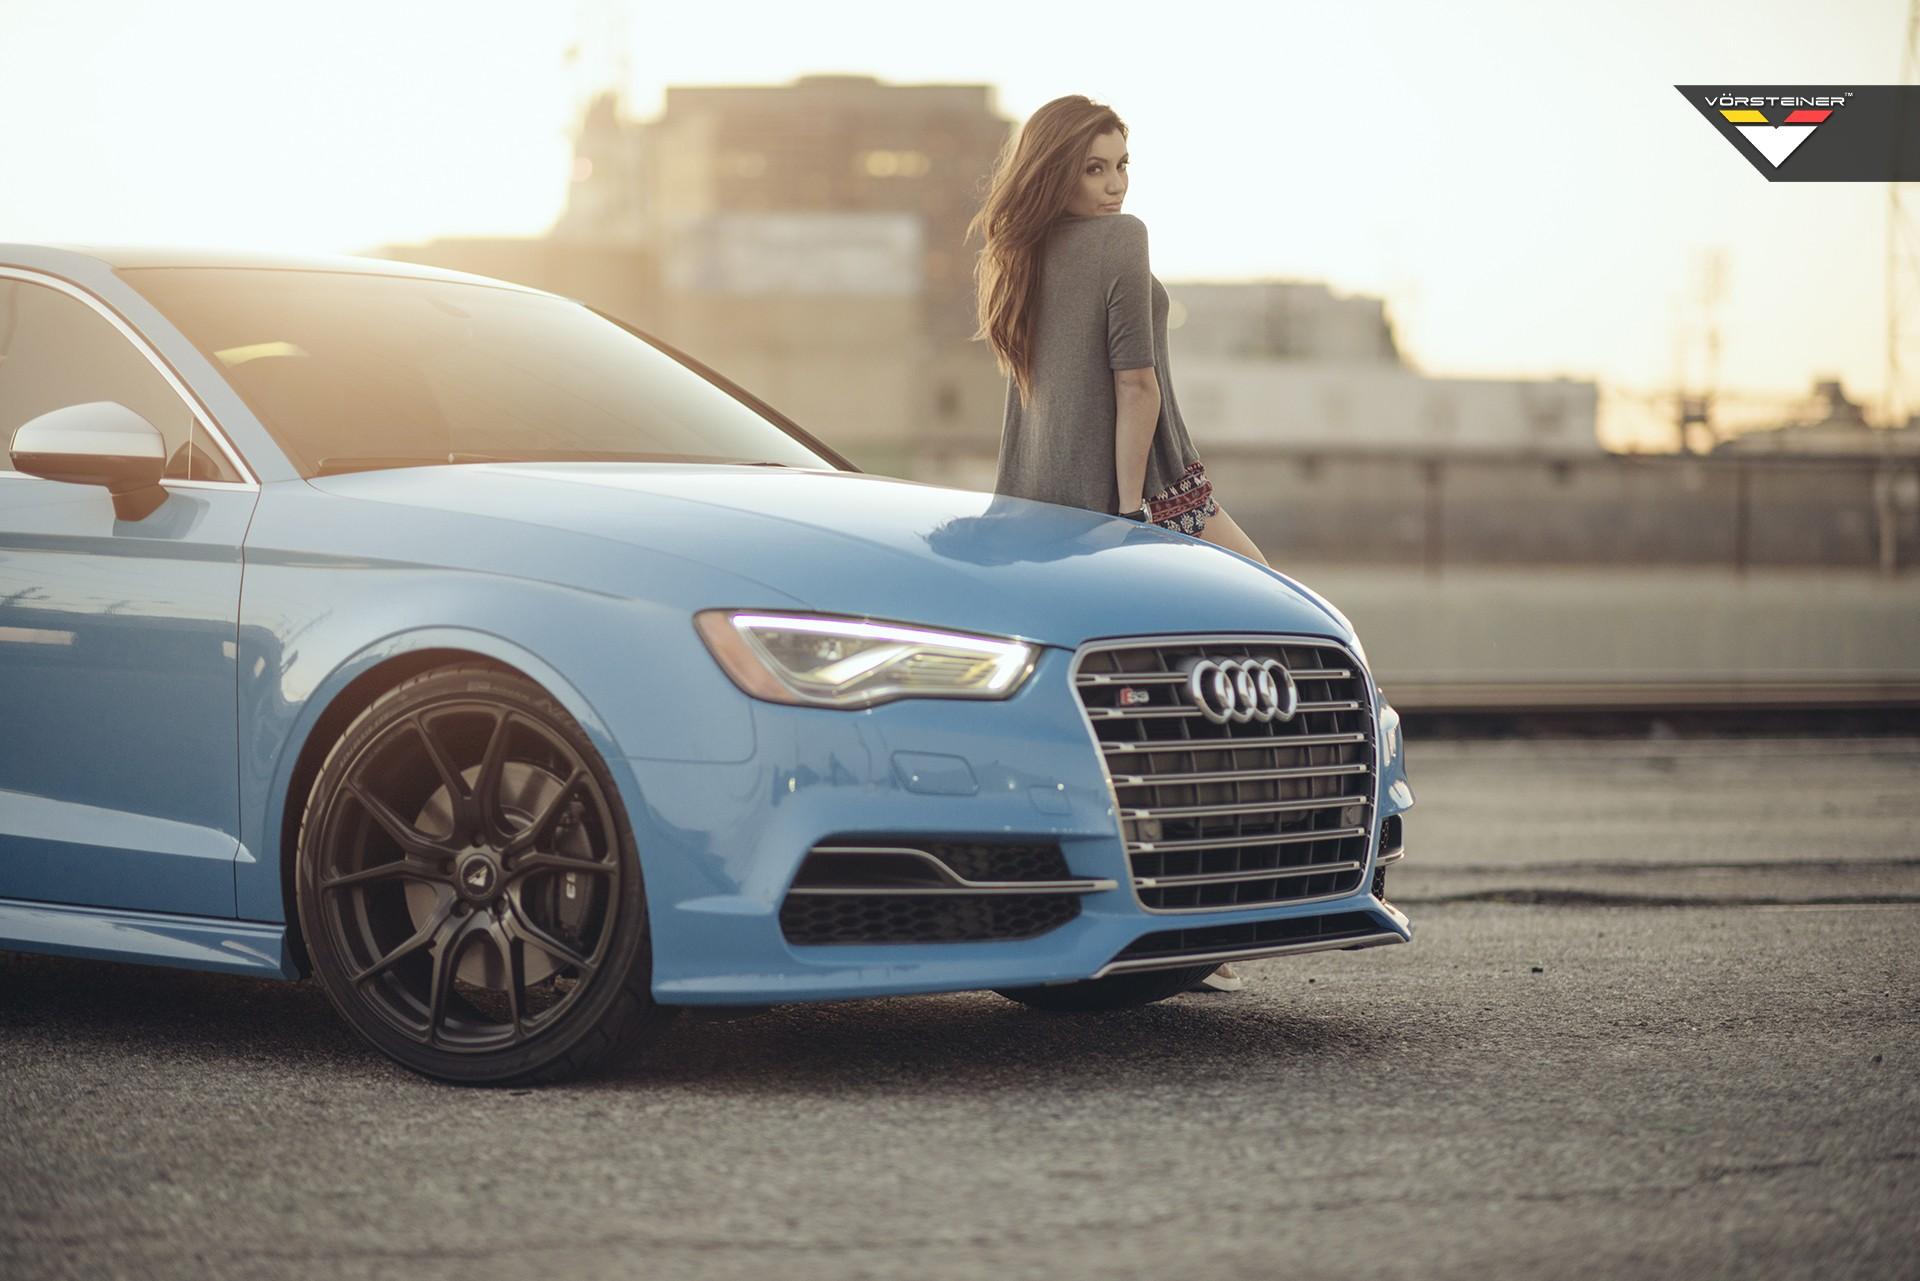 Car Rims And Tires Wallpaper Sky Blue Audi S3 Sedan On Vorsteiner V Ff 103 Wheels In